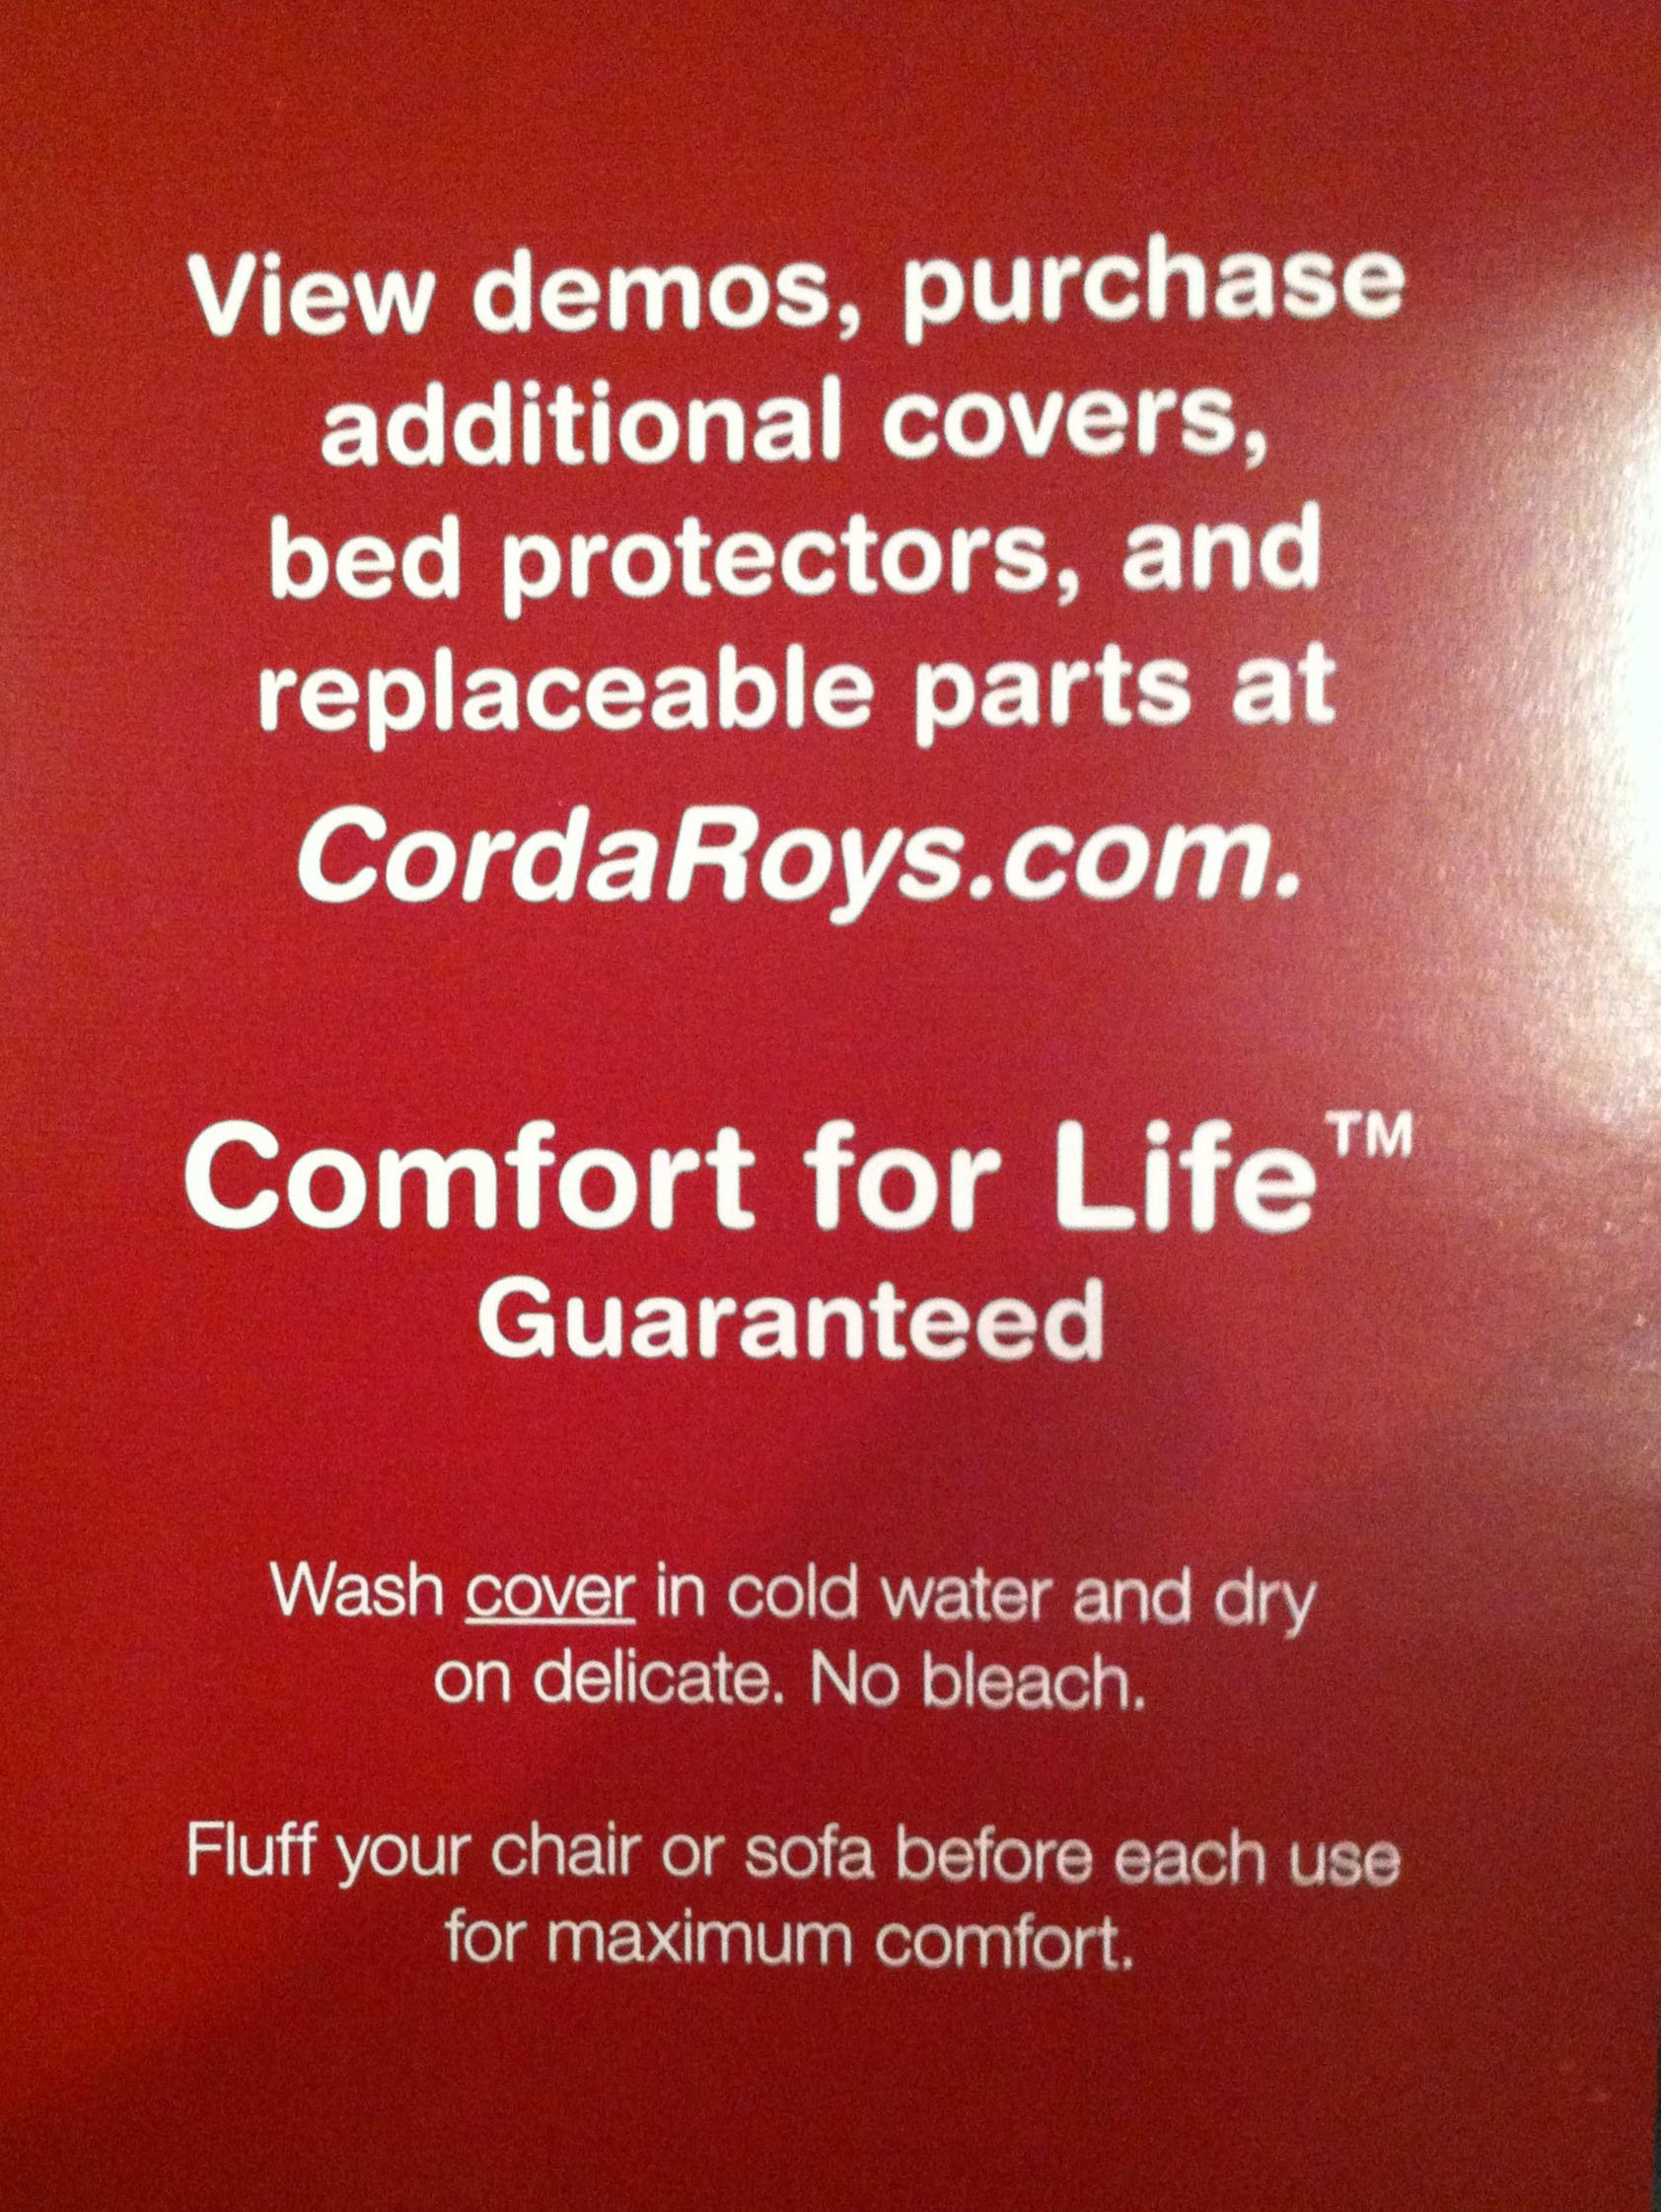 CordaRoy's Guarantee_